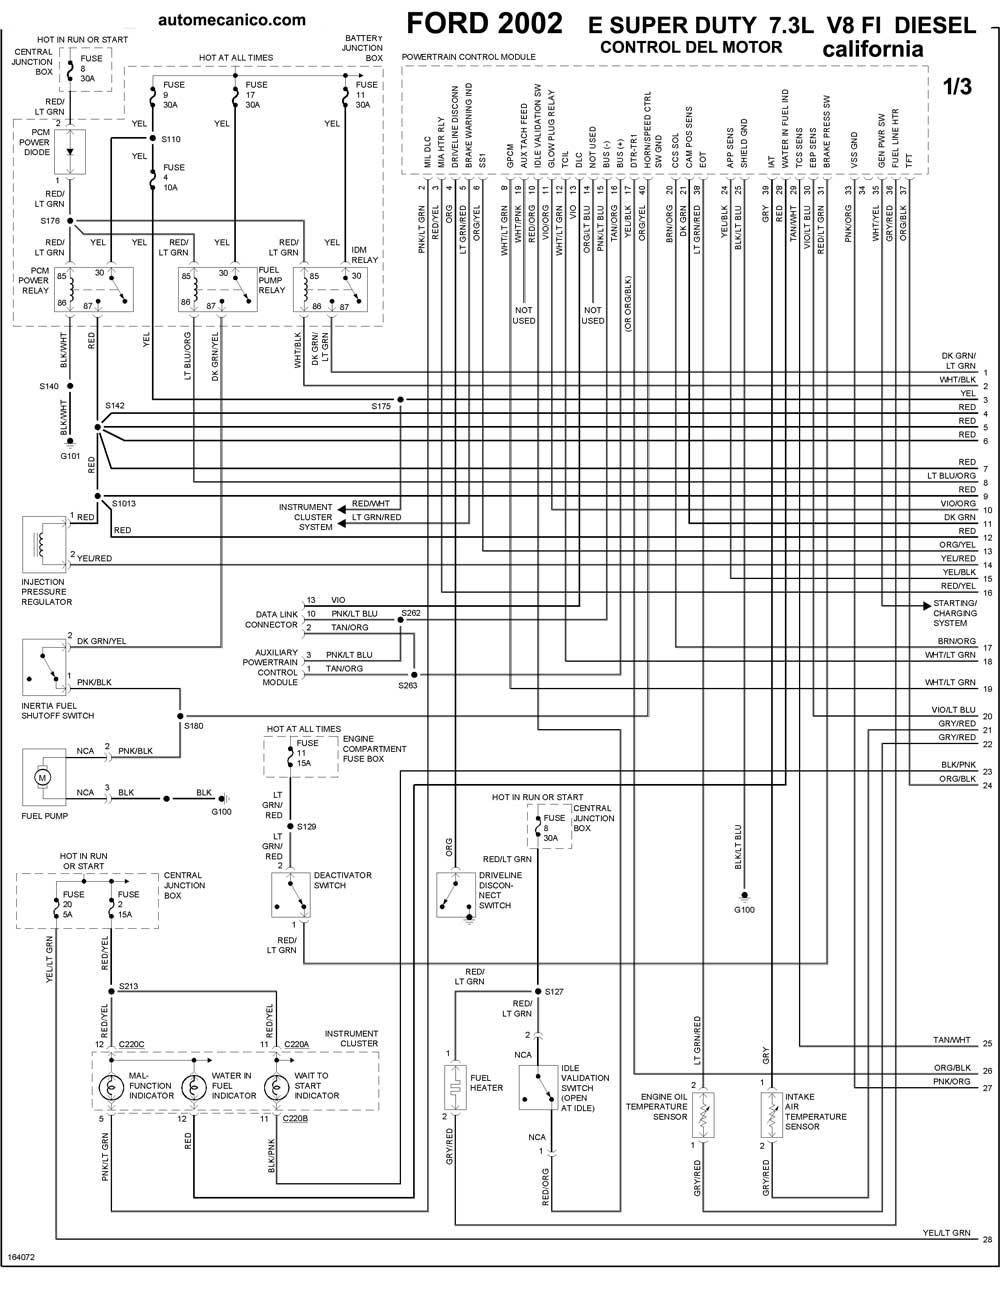 ford 6 4 liter diesel Diagrama del motor